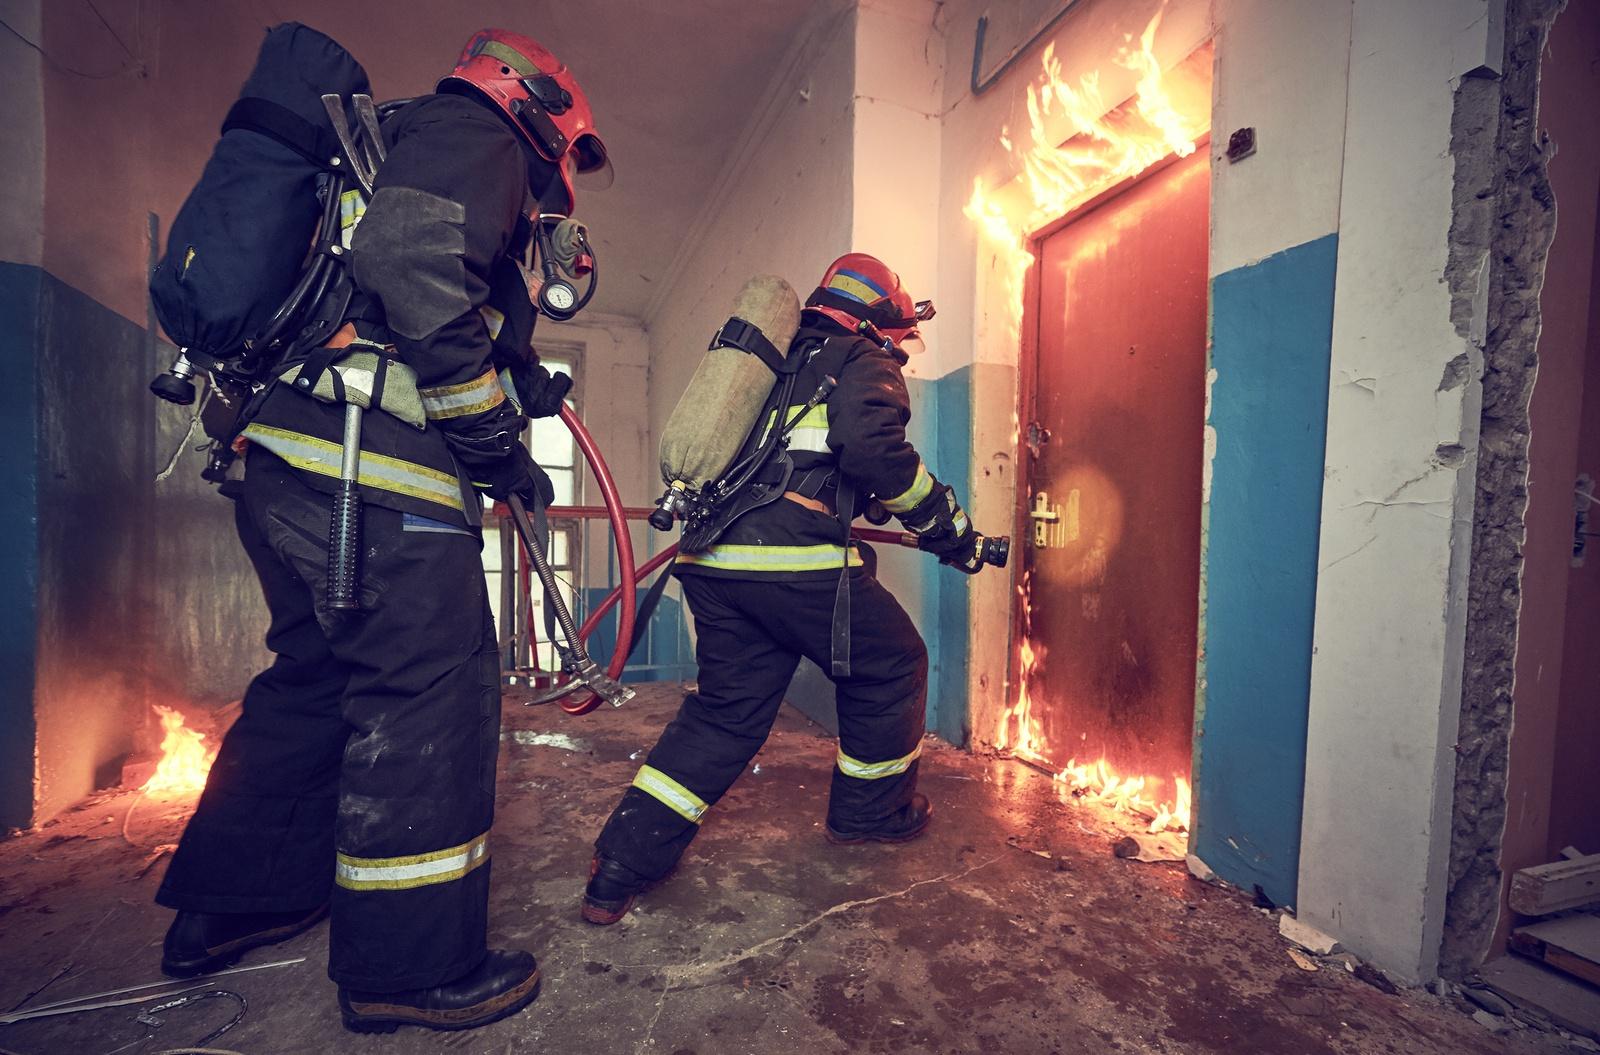 bigstock-Firemans-team-during-firefight-200543074.jpg